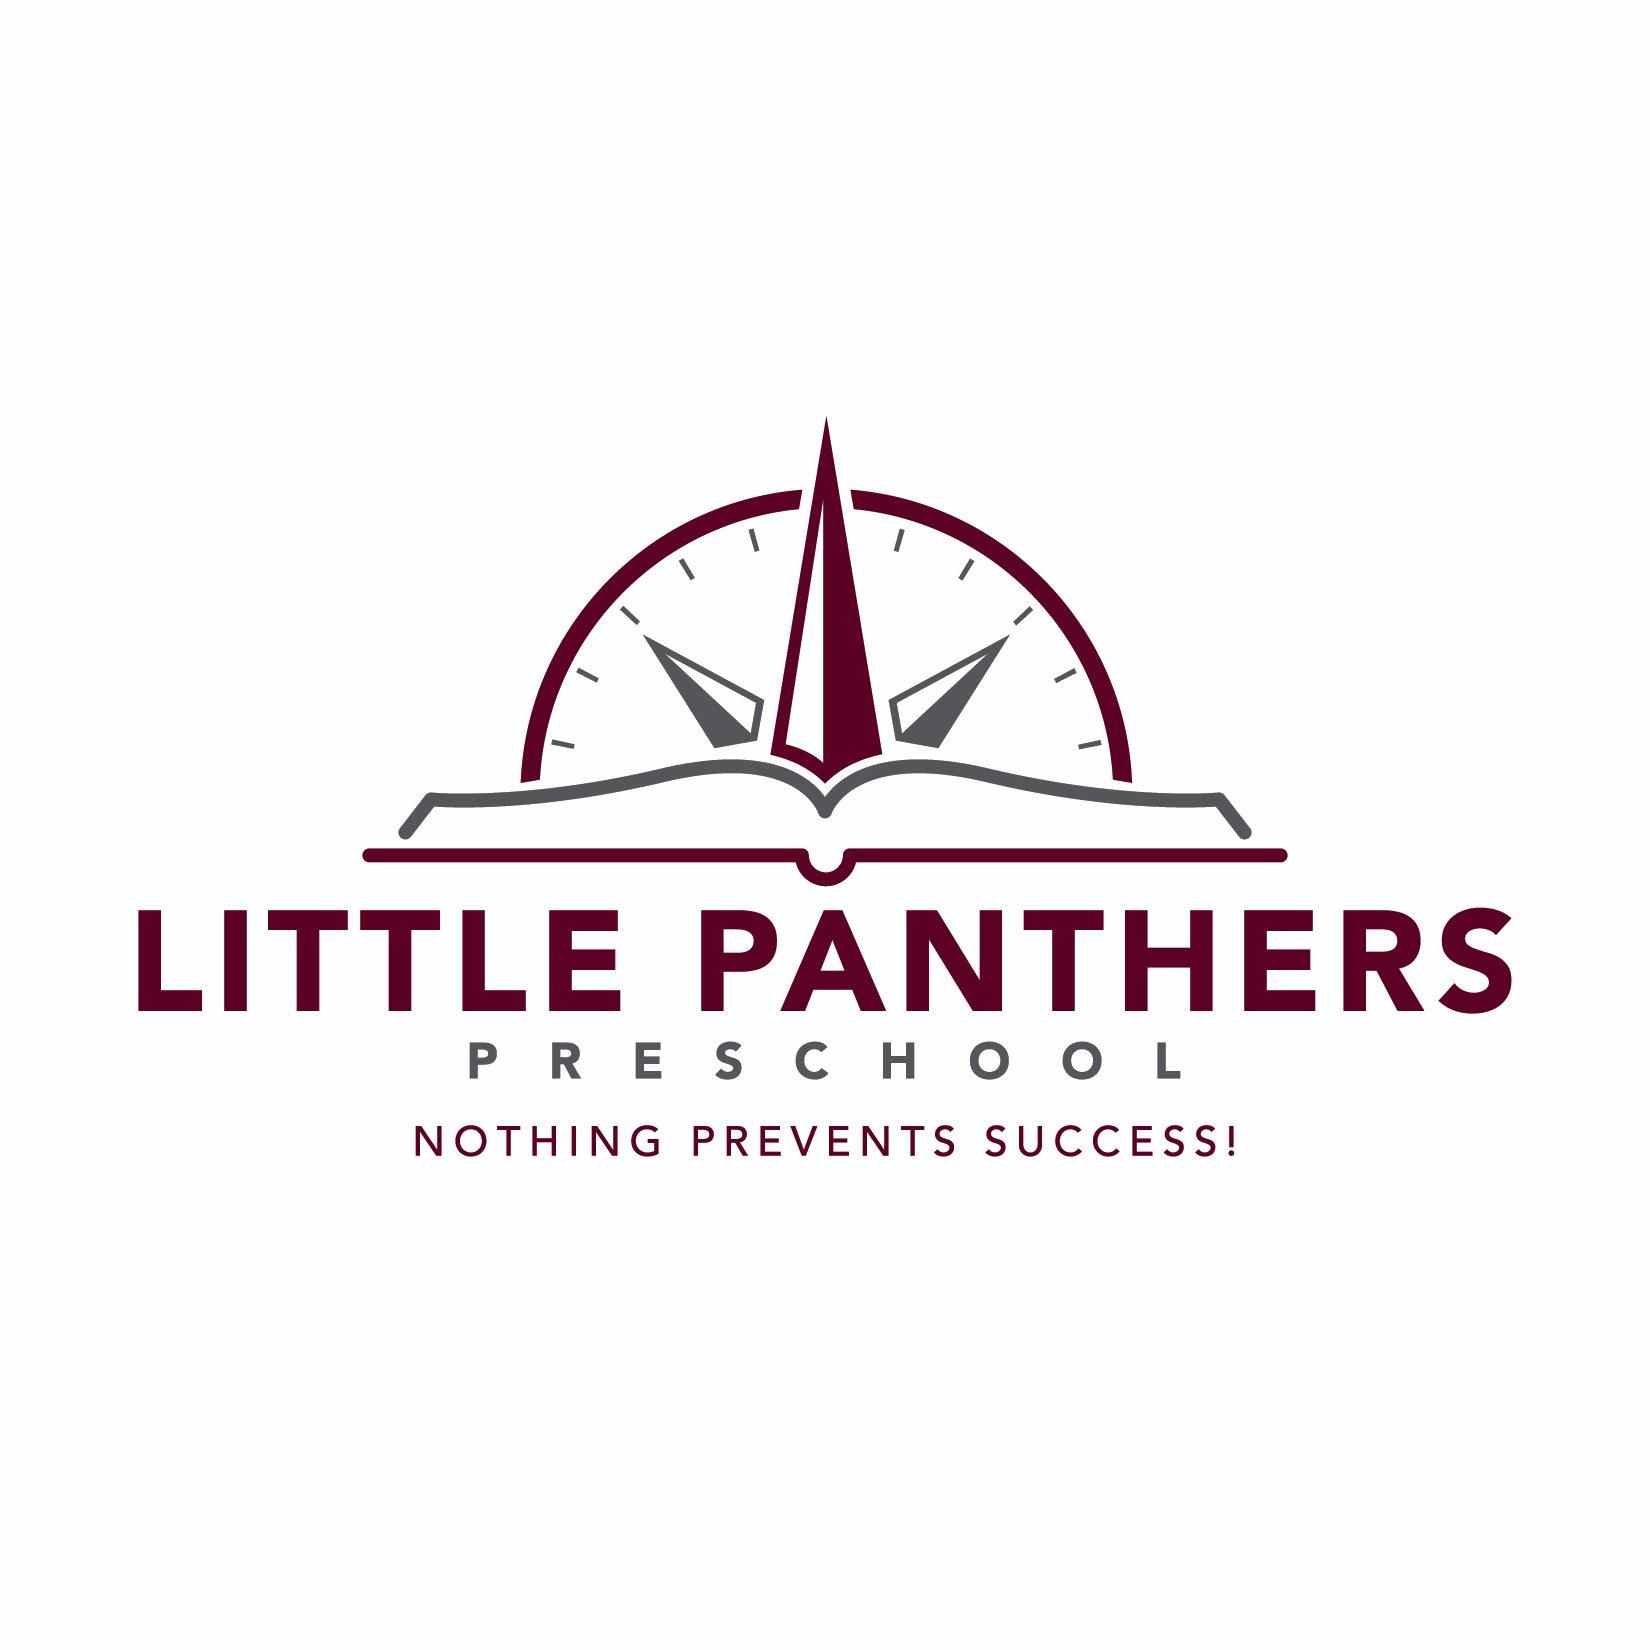 Little Panthers Preschool